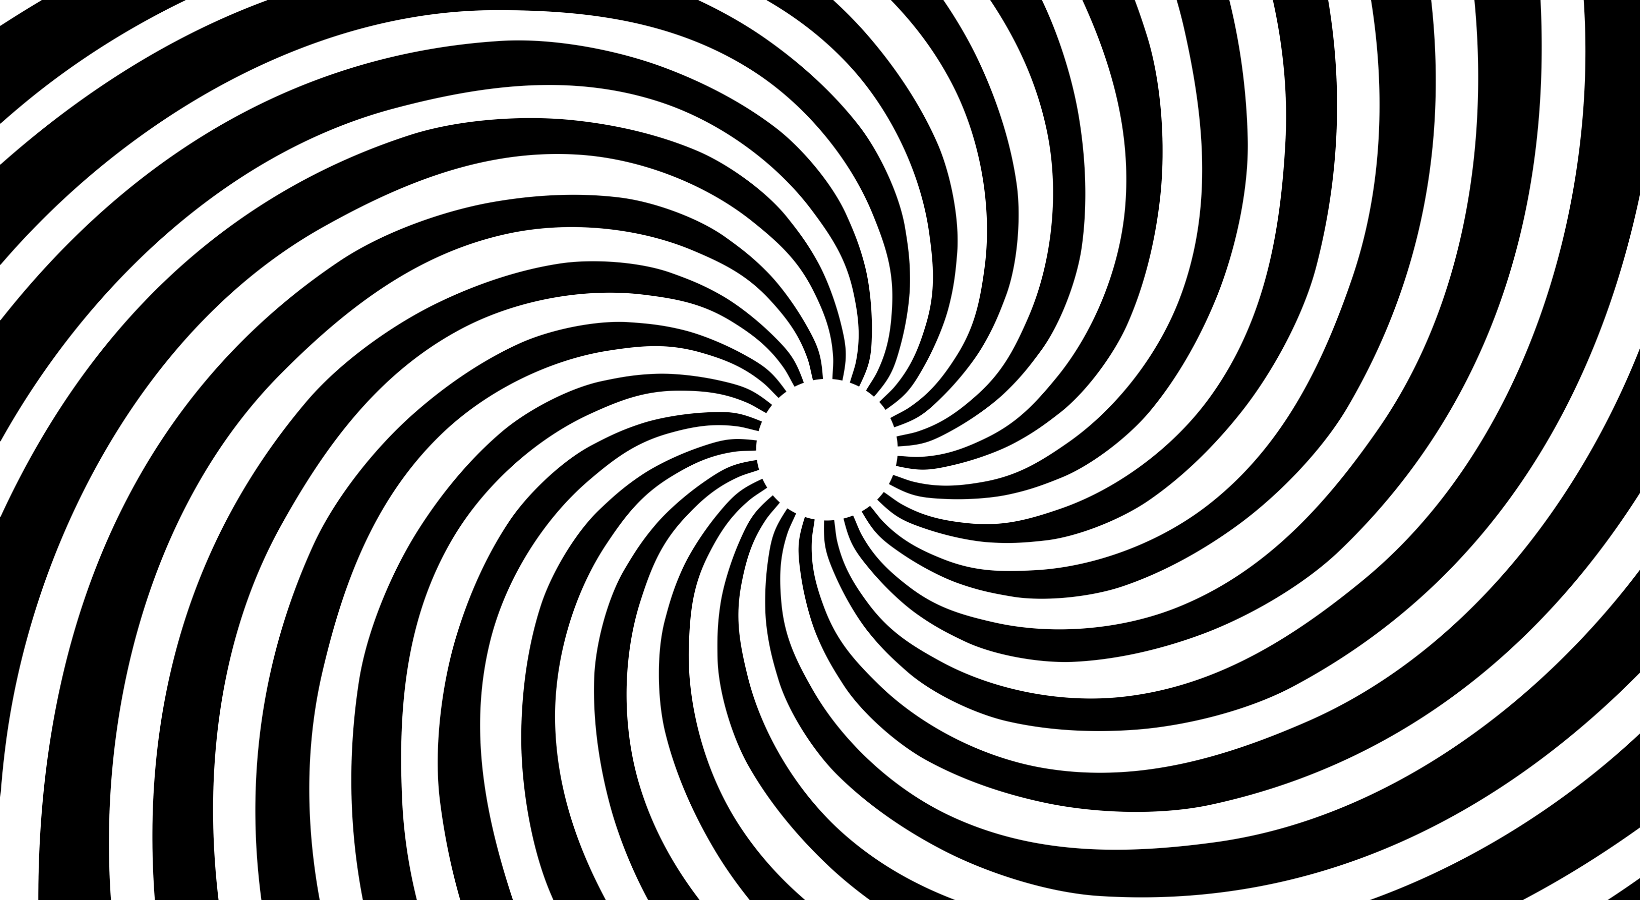 Swirl Tunnel, James Bond Backdrop, Austin Power Parties, 70's backdrop, etc..